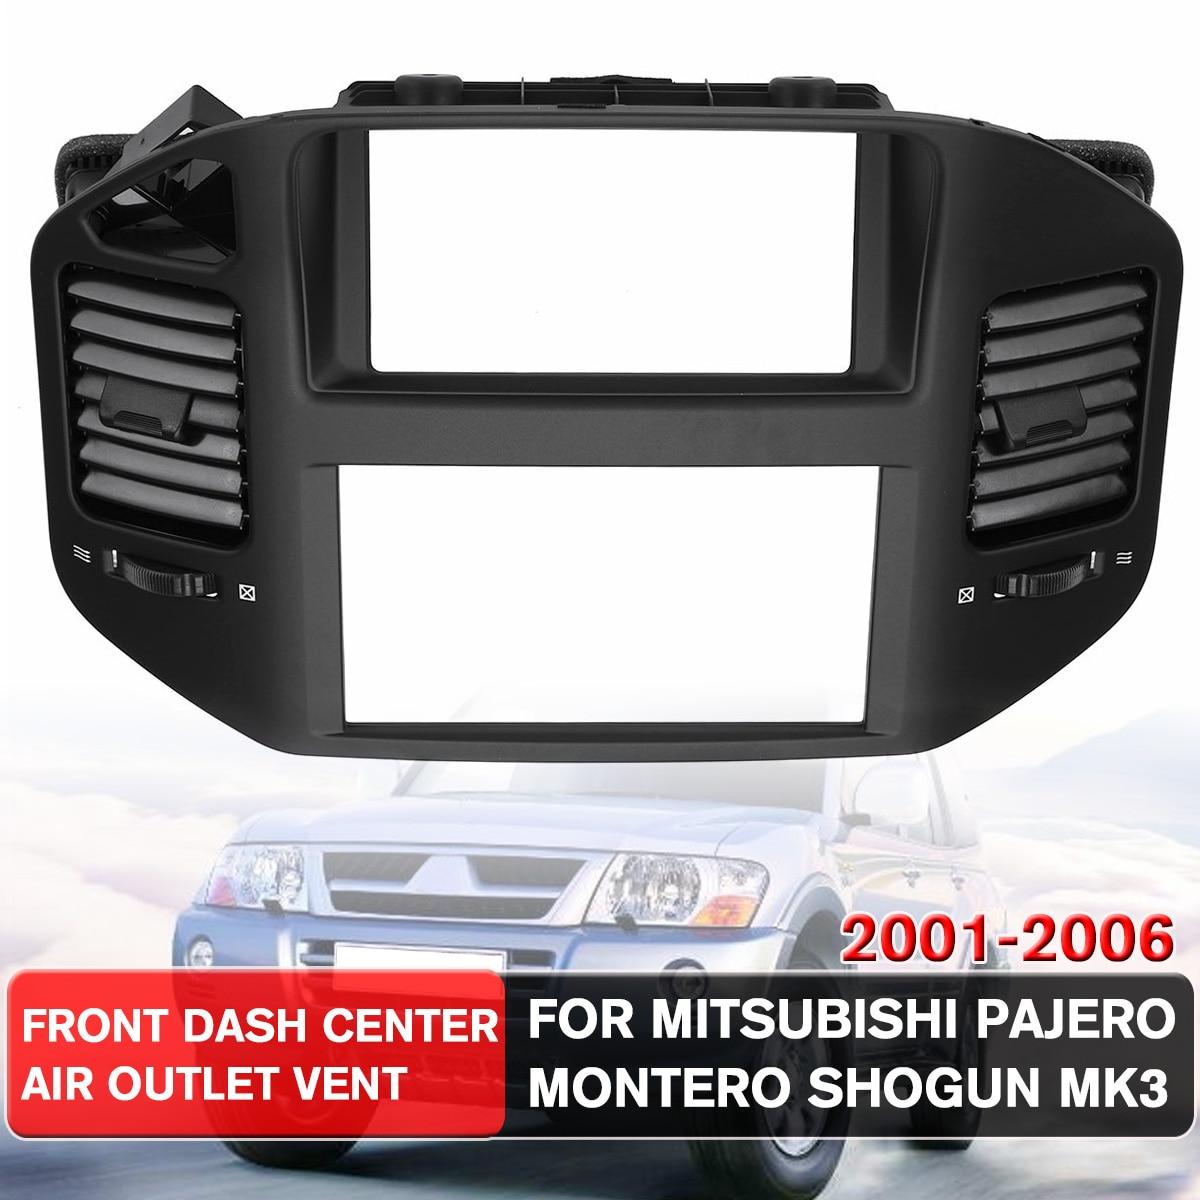 NIEUWE 1Pcs Black Front Dashboard Air Vent Outlet Panel Voor Mitsubishi Pajero Montero Shogun MK3 2001 2006